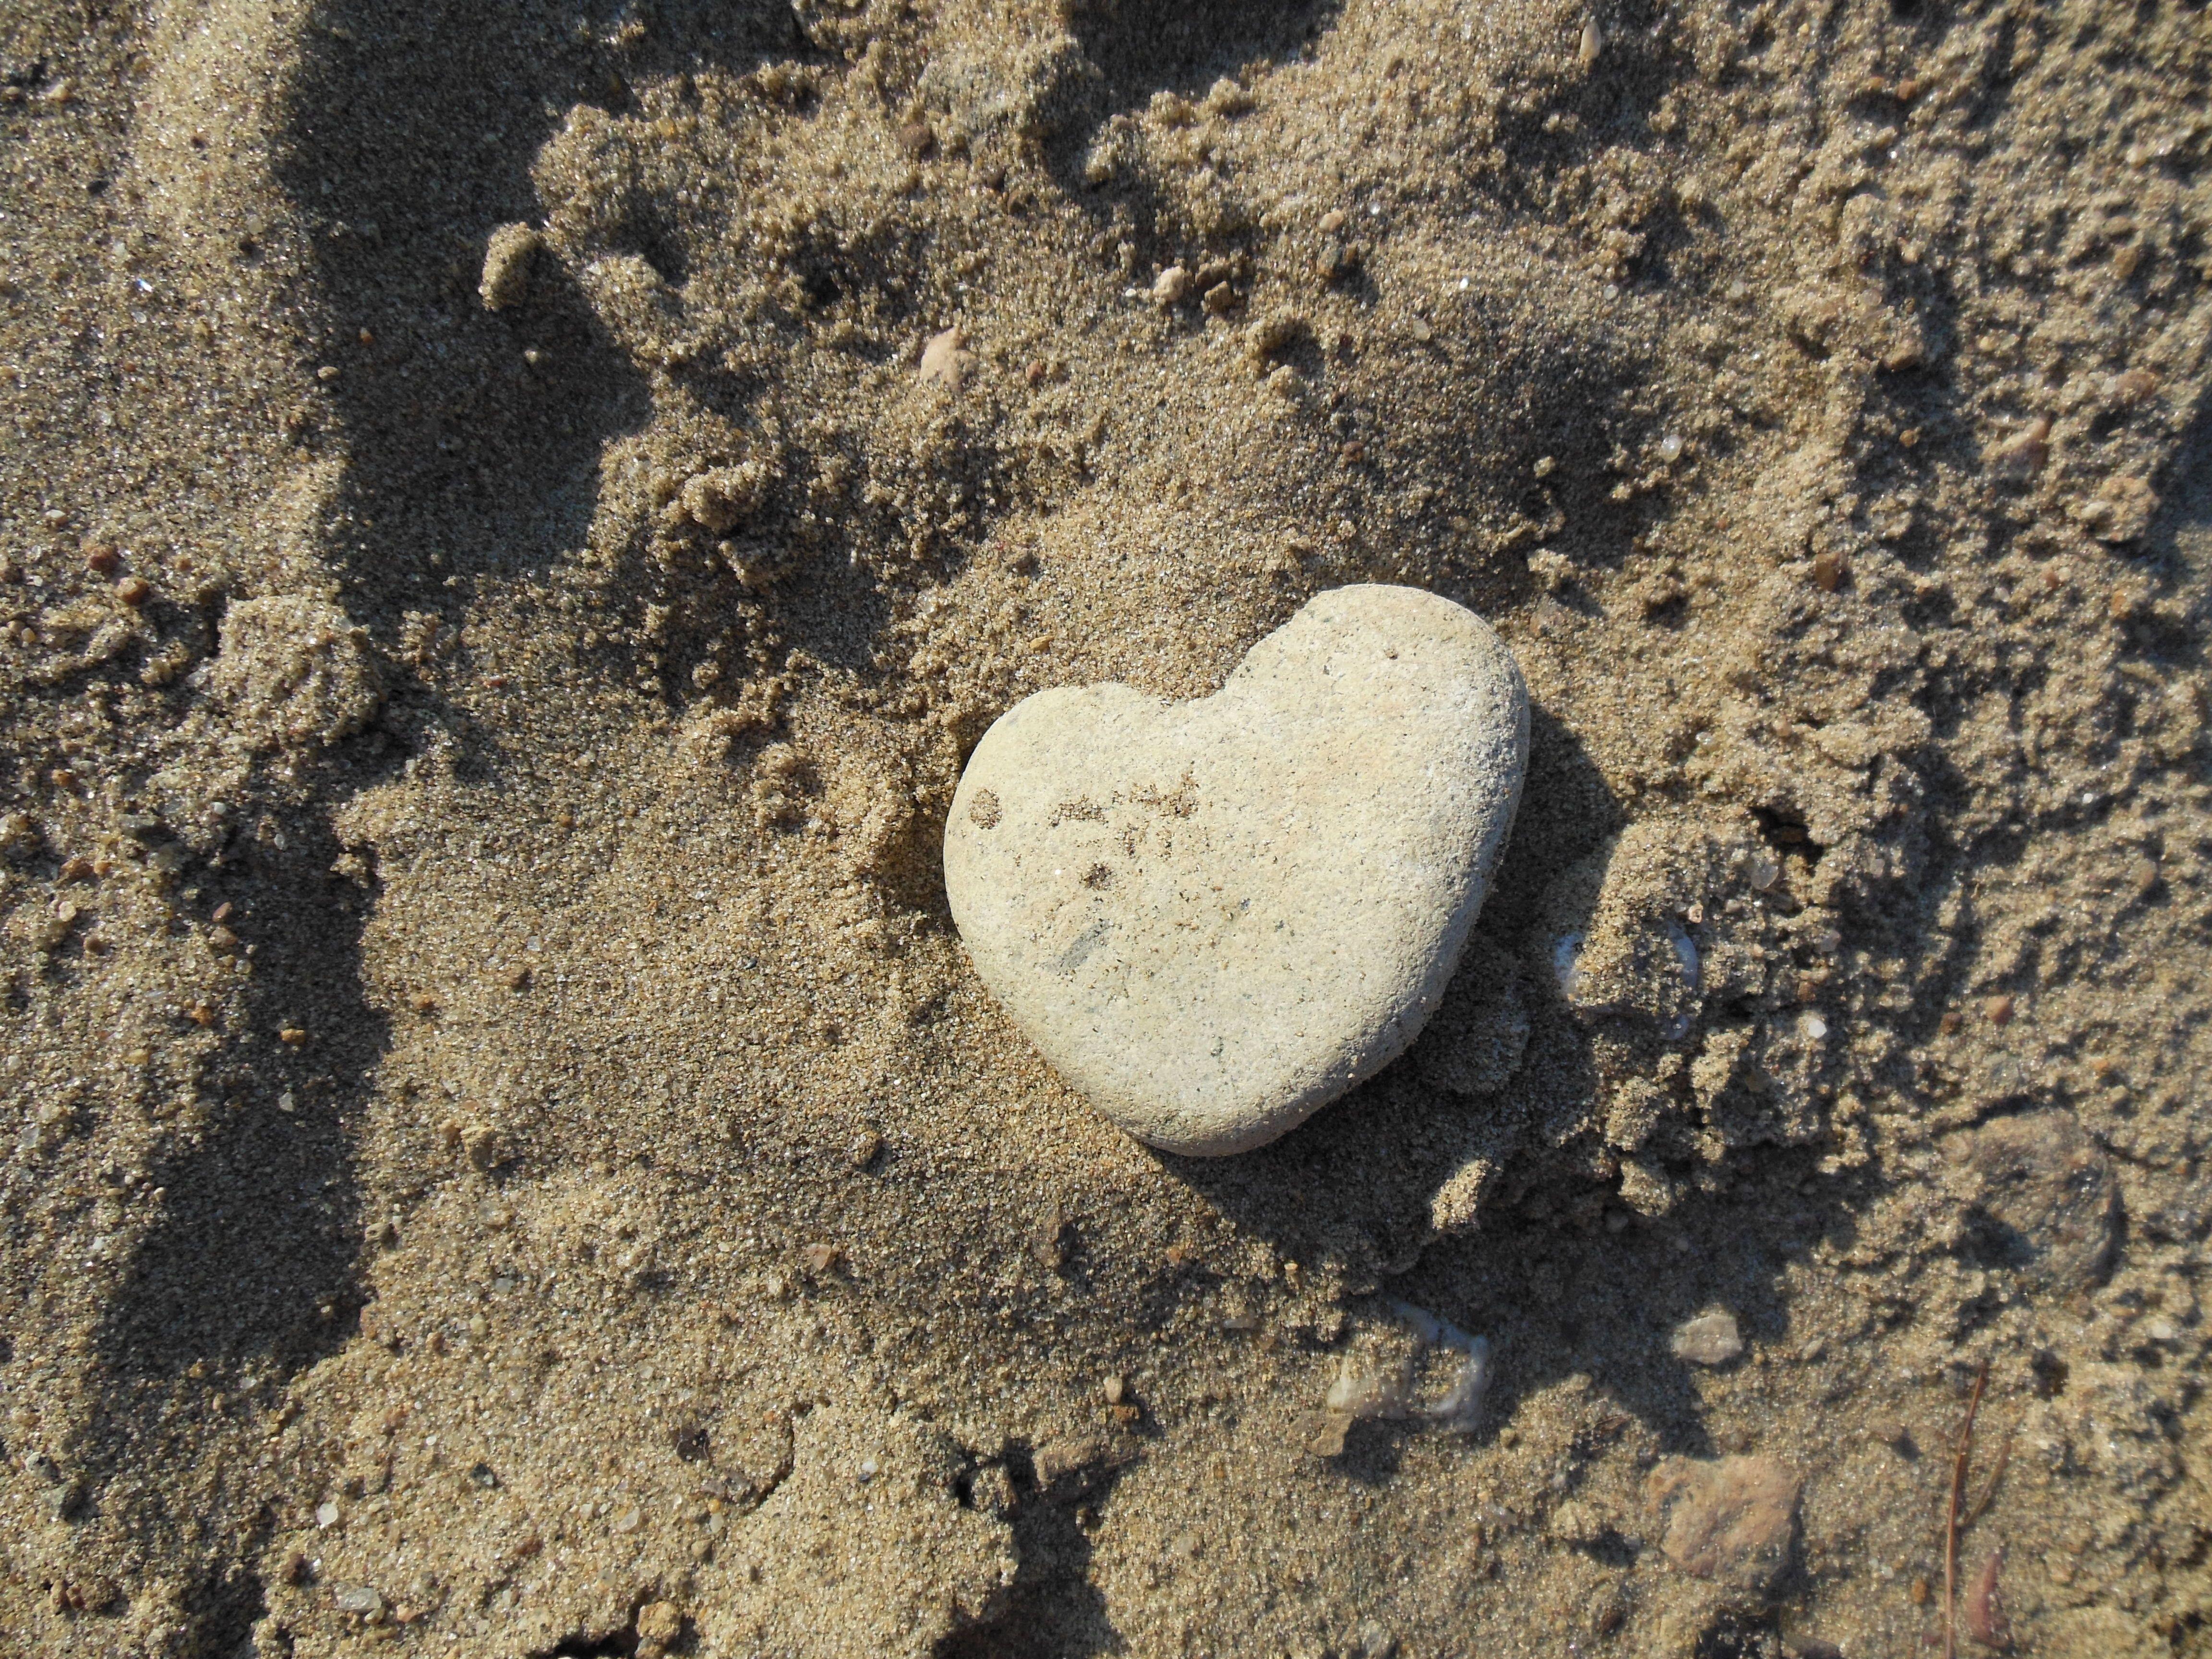 Heart at Sacandaga